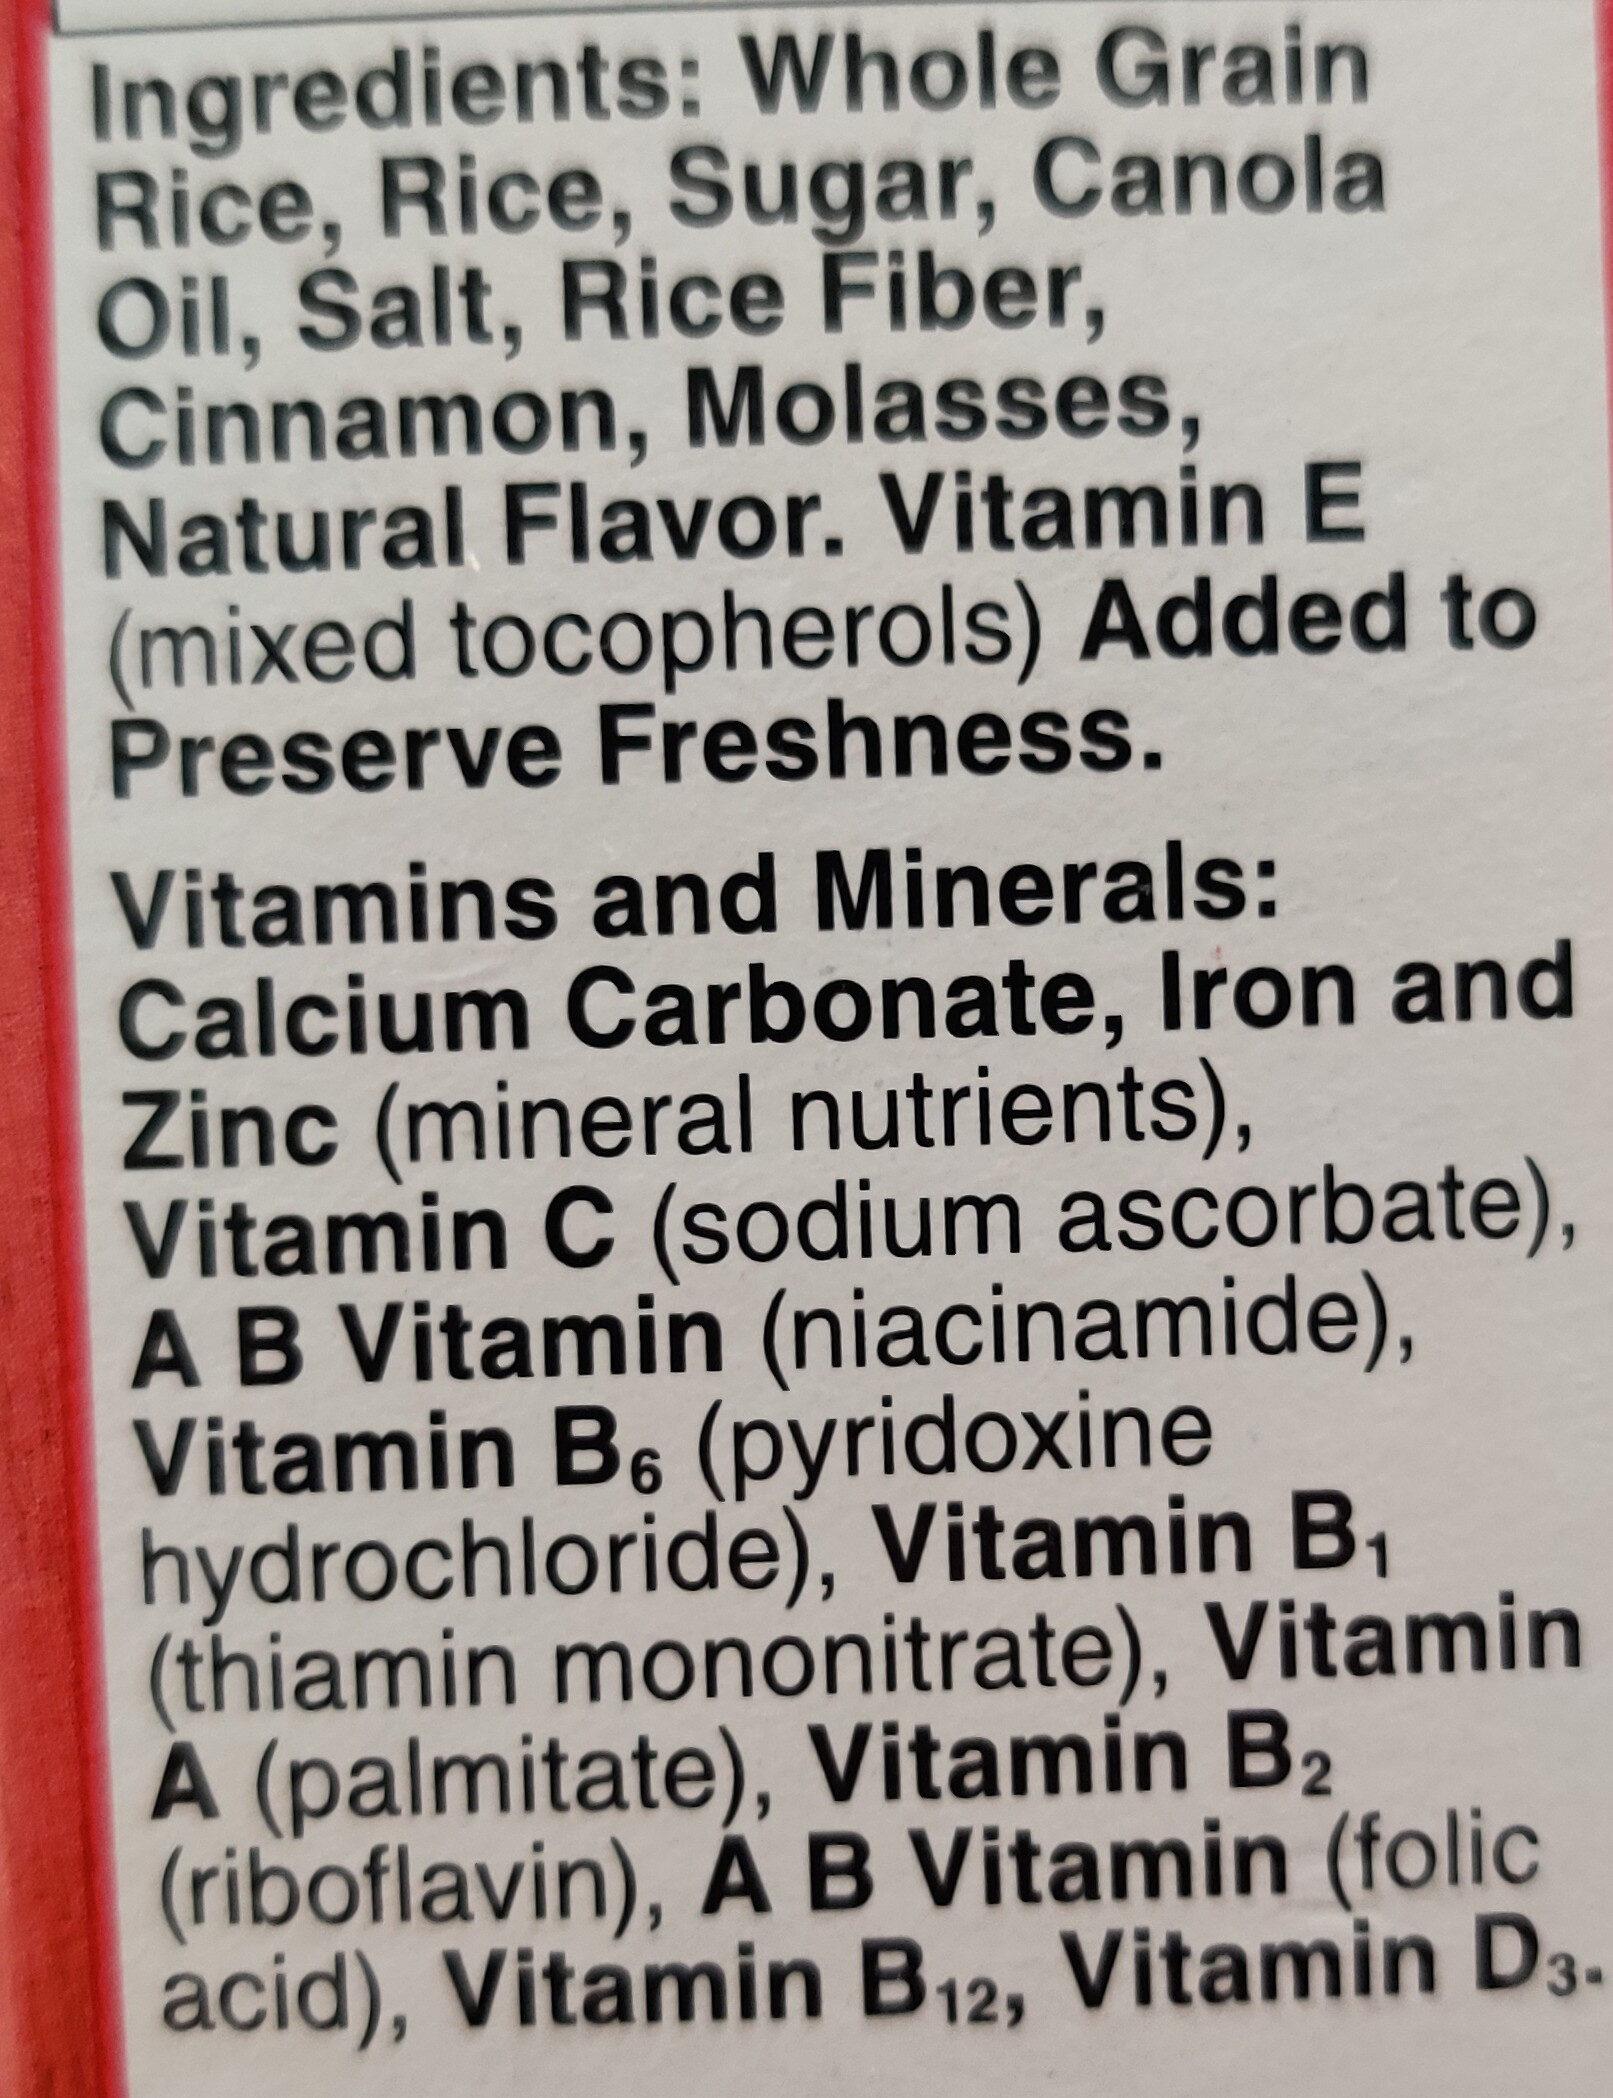 Chex Cinnamon gluten fre - Ingredients - en